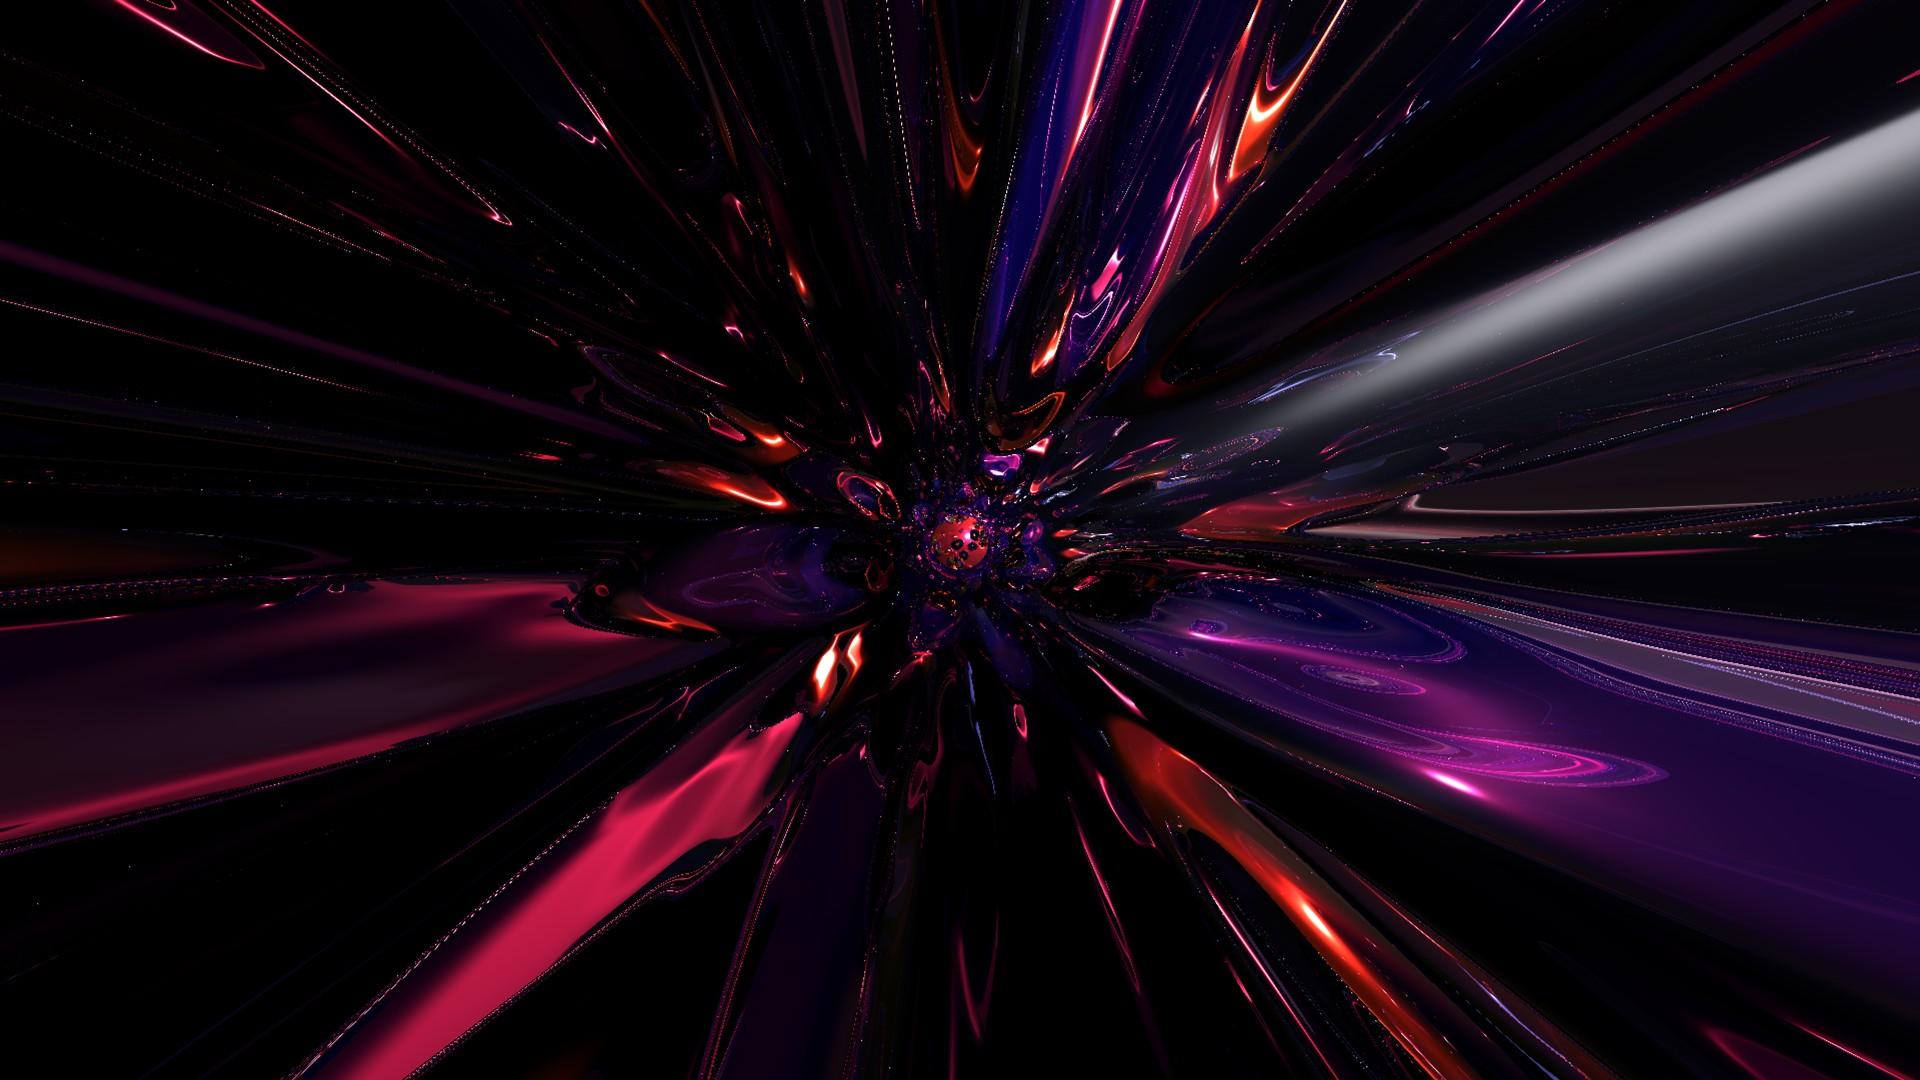 Neon Wallpaper 3d Gfx Background 01 1920x1080